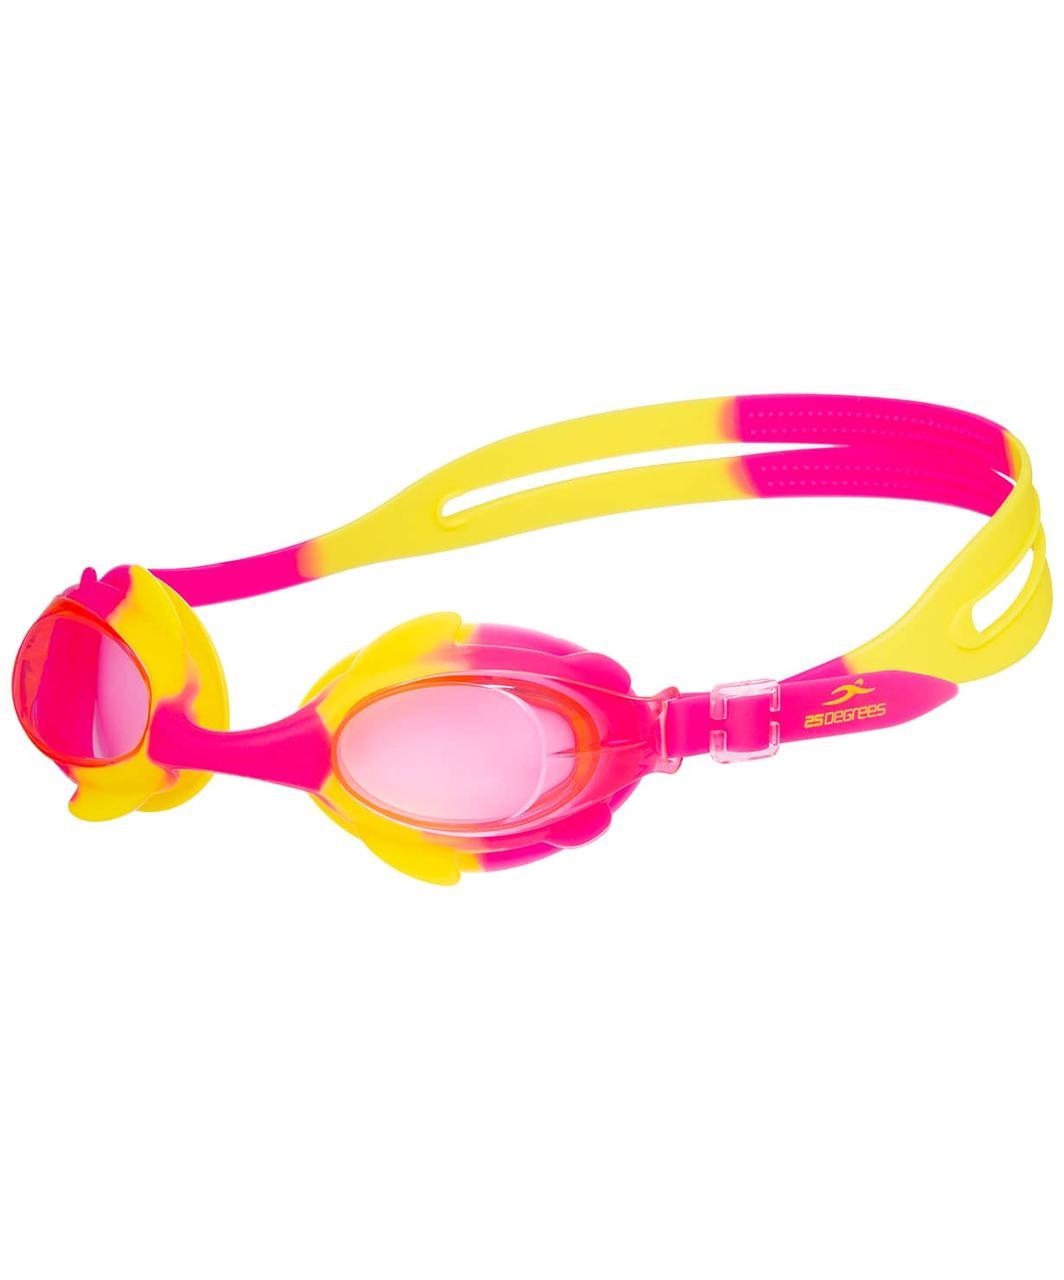 Очки для плавания Yunga Pink/Yellow, детские 25Degrees